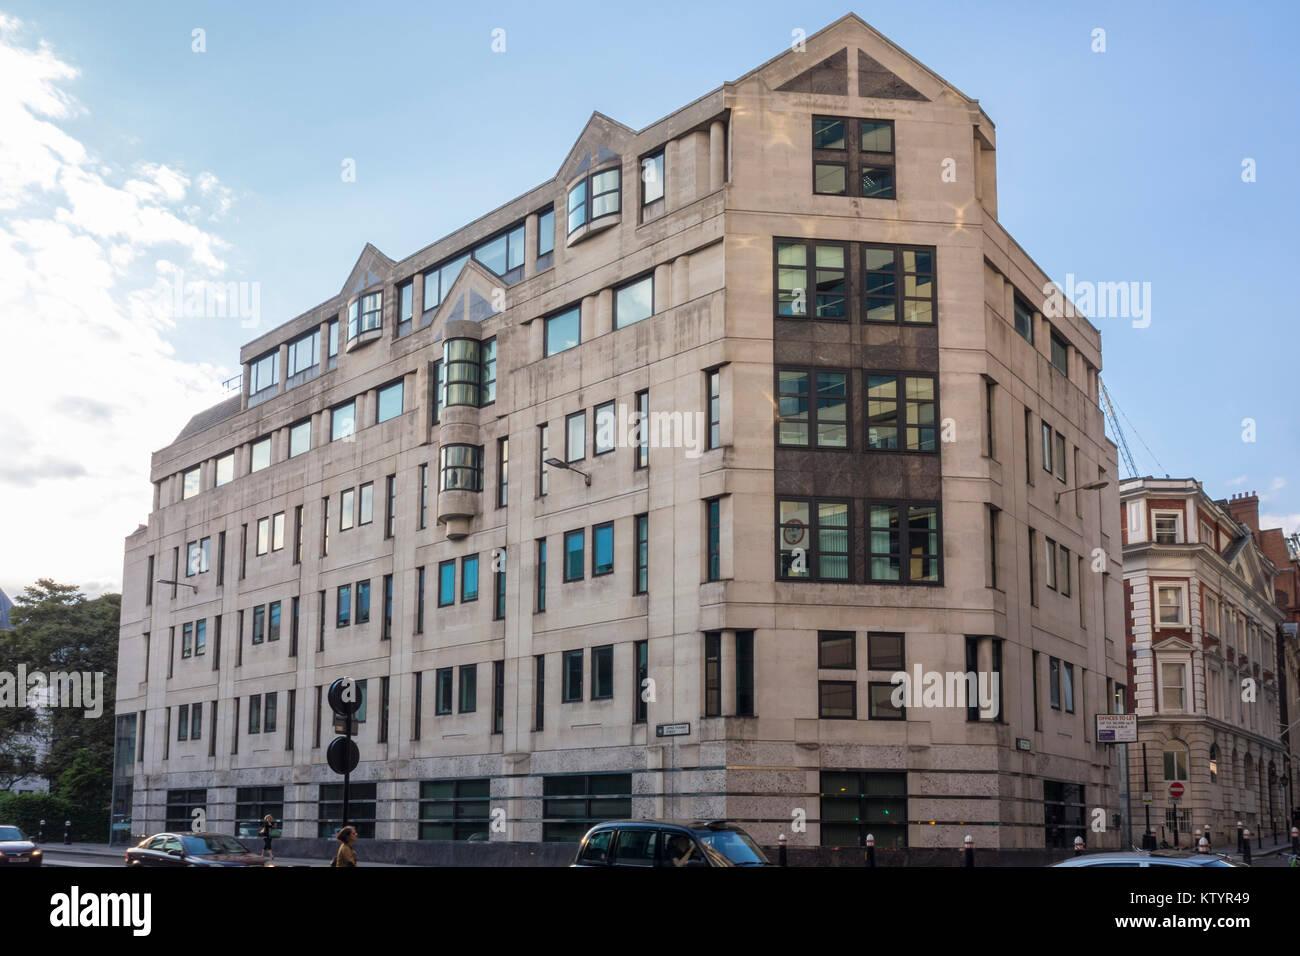 Postmodern building Dowgate Hill House by Hamilton Associates (1987-89), Upper Thames Street, City of London, UK - Stock Image